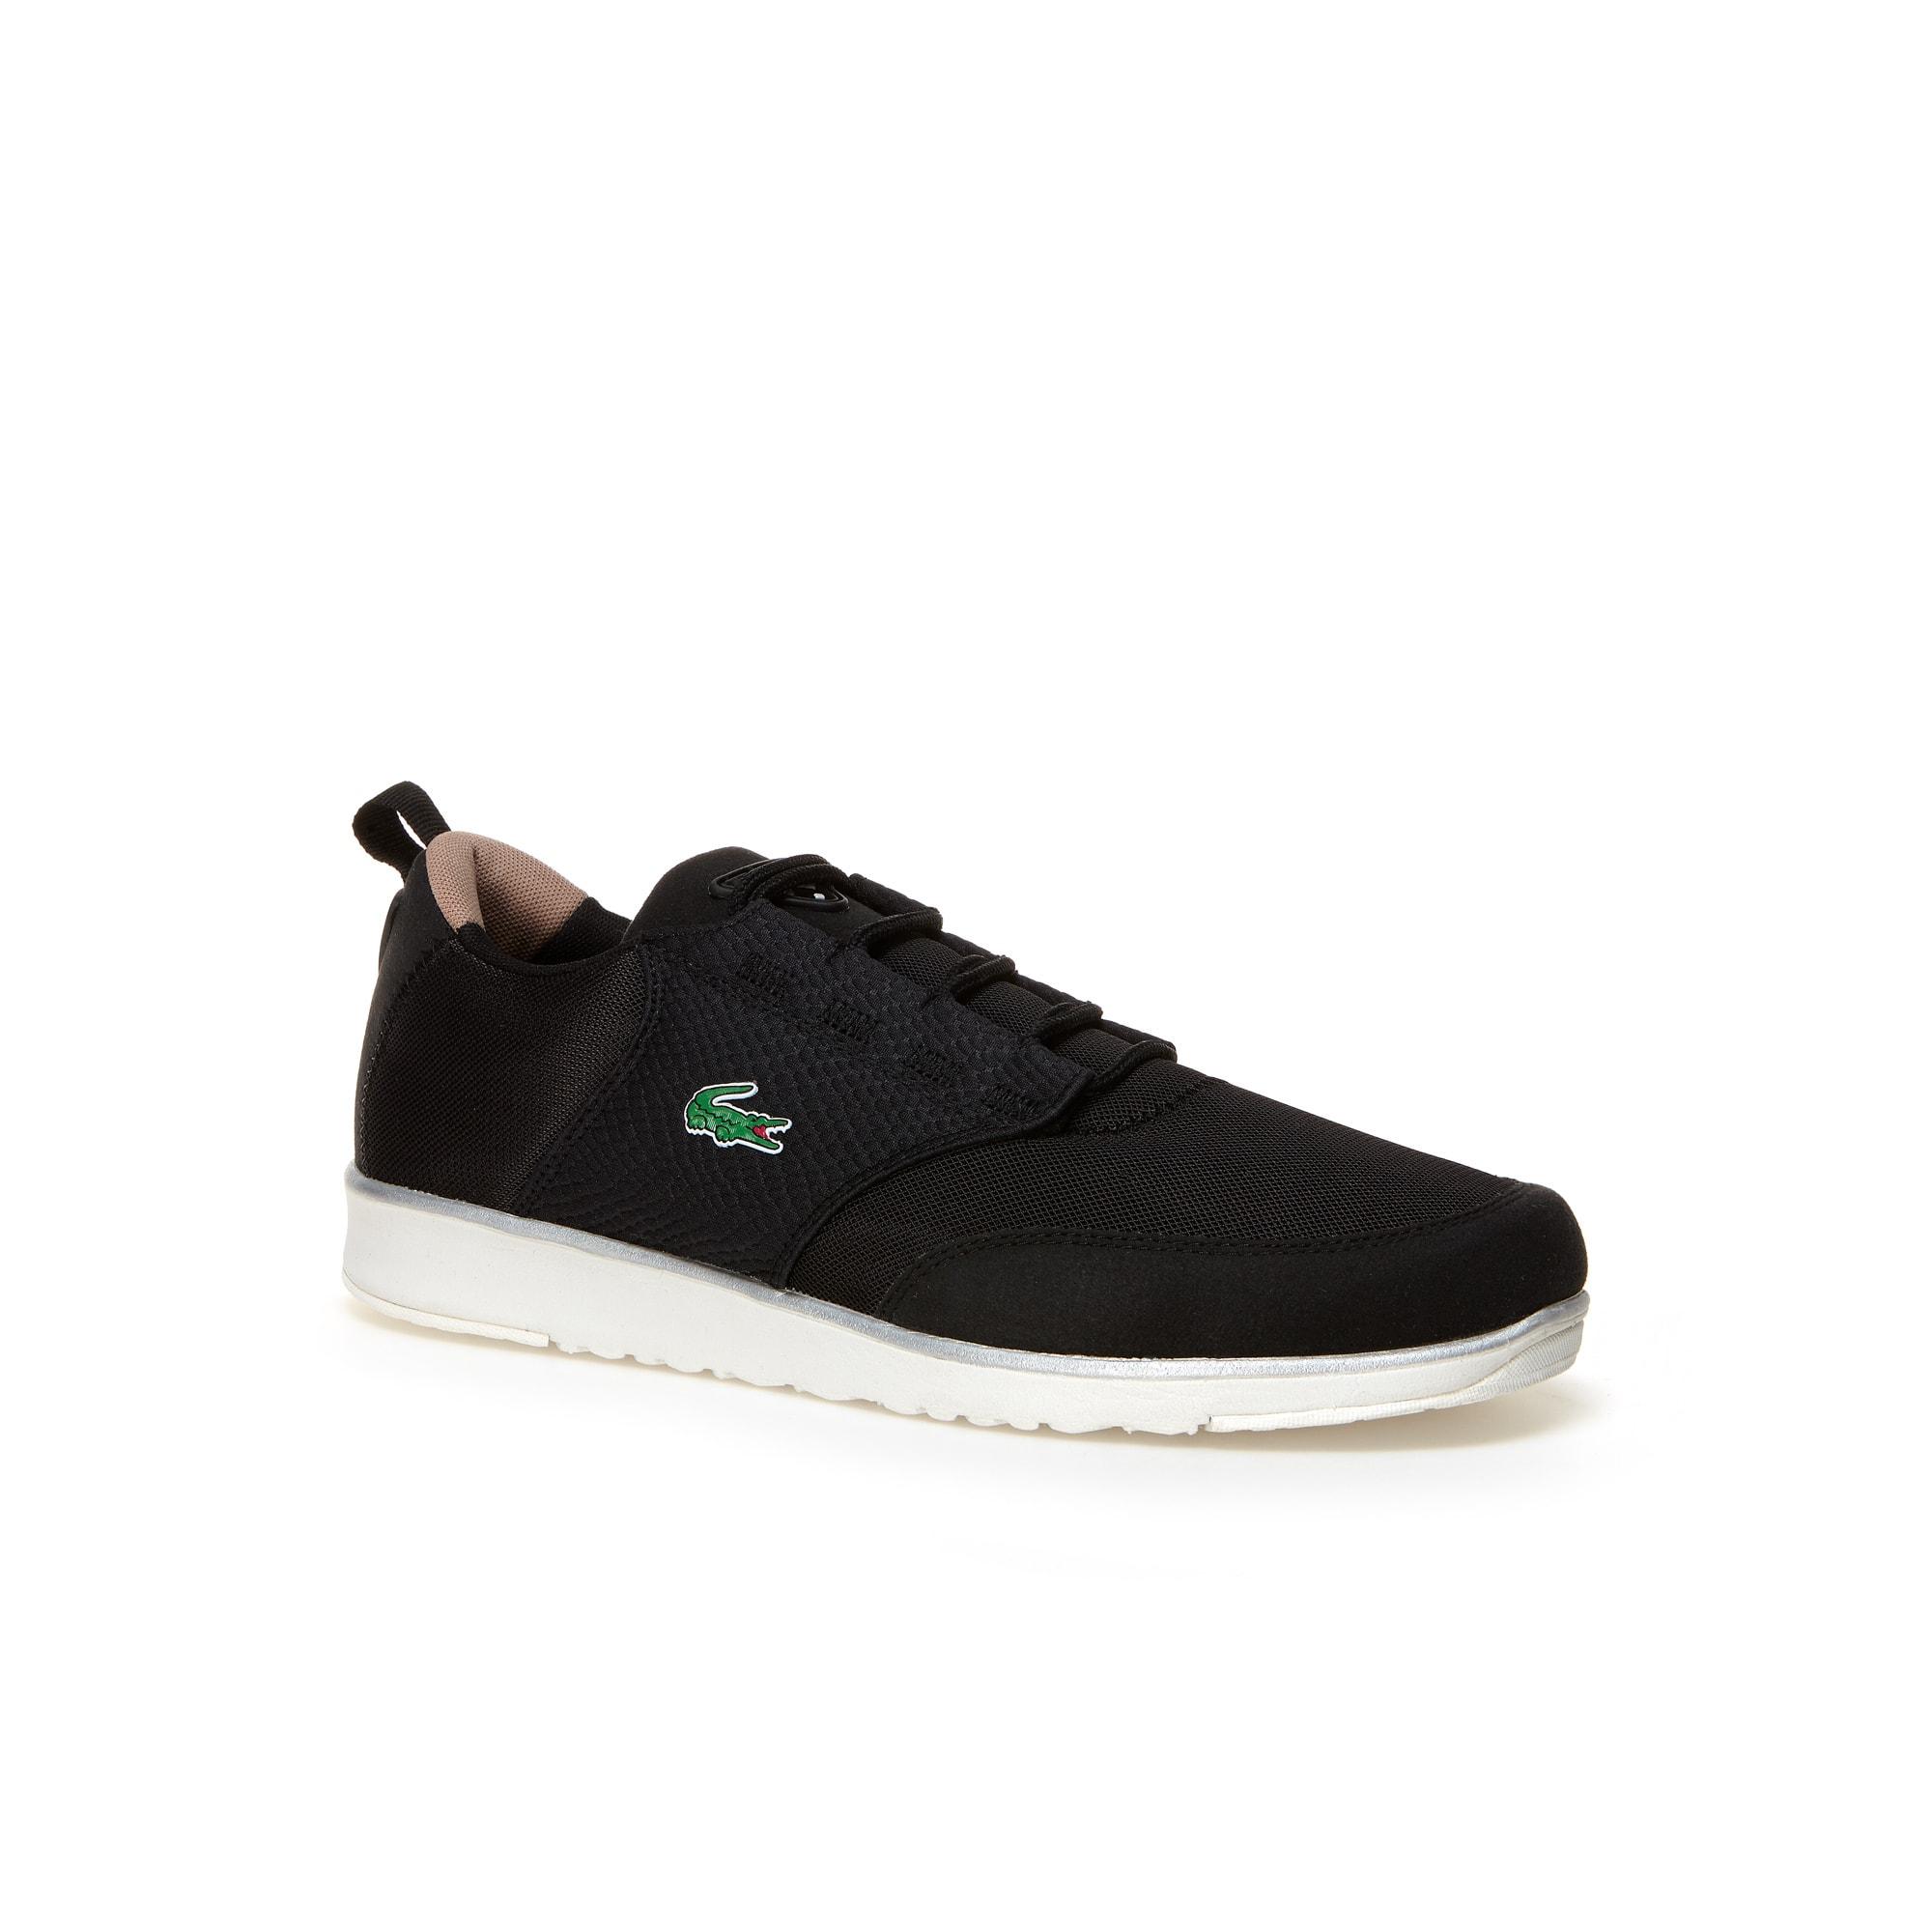 Herren-Sneakers L.IGHT aus Stoff